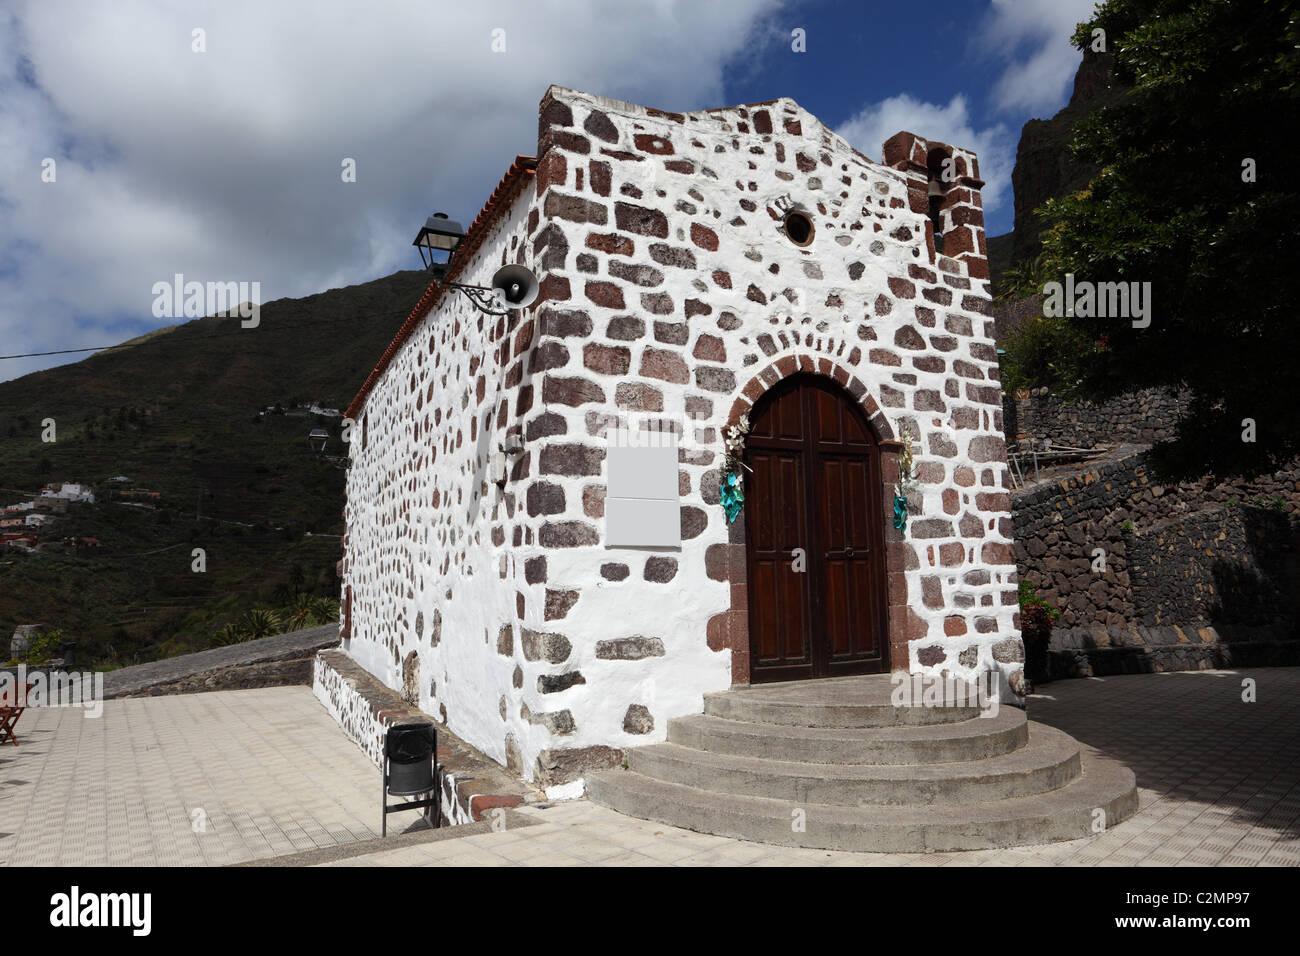 Kapelle im Dorf Masca, Kanarische Insel Teneriffa, Spanien Stockbild